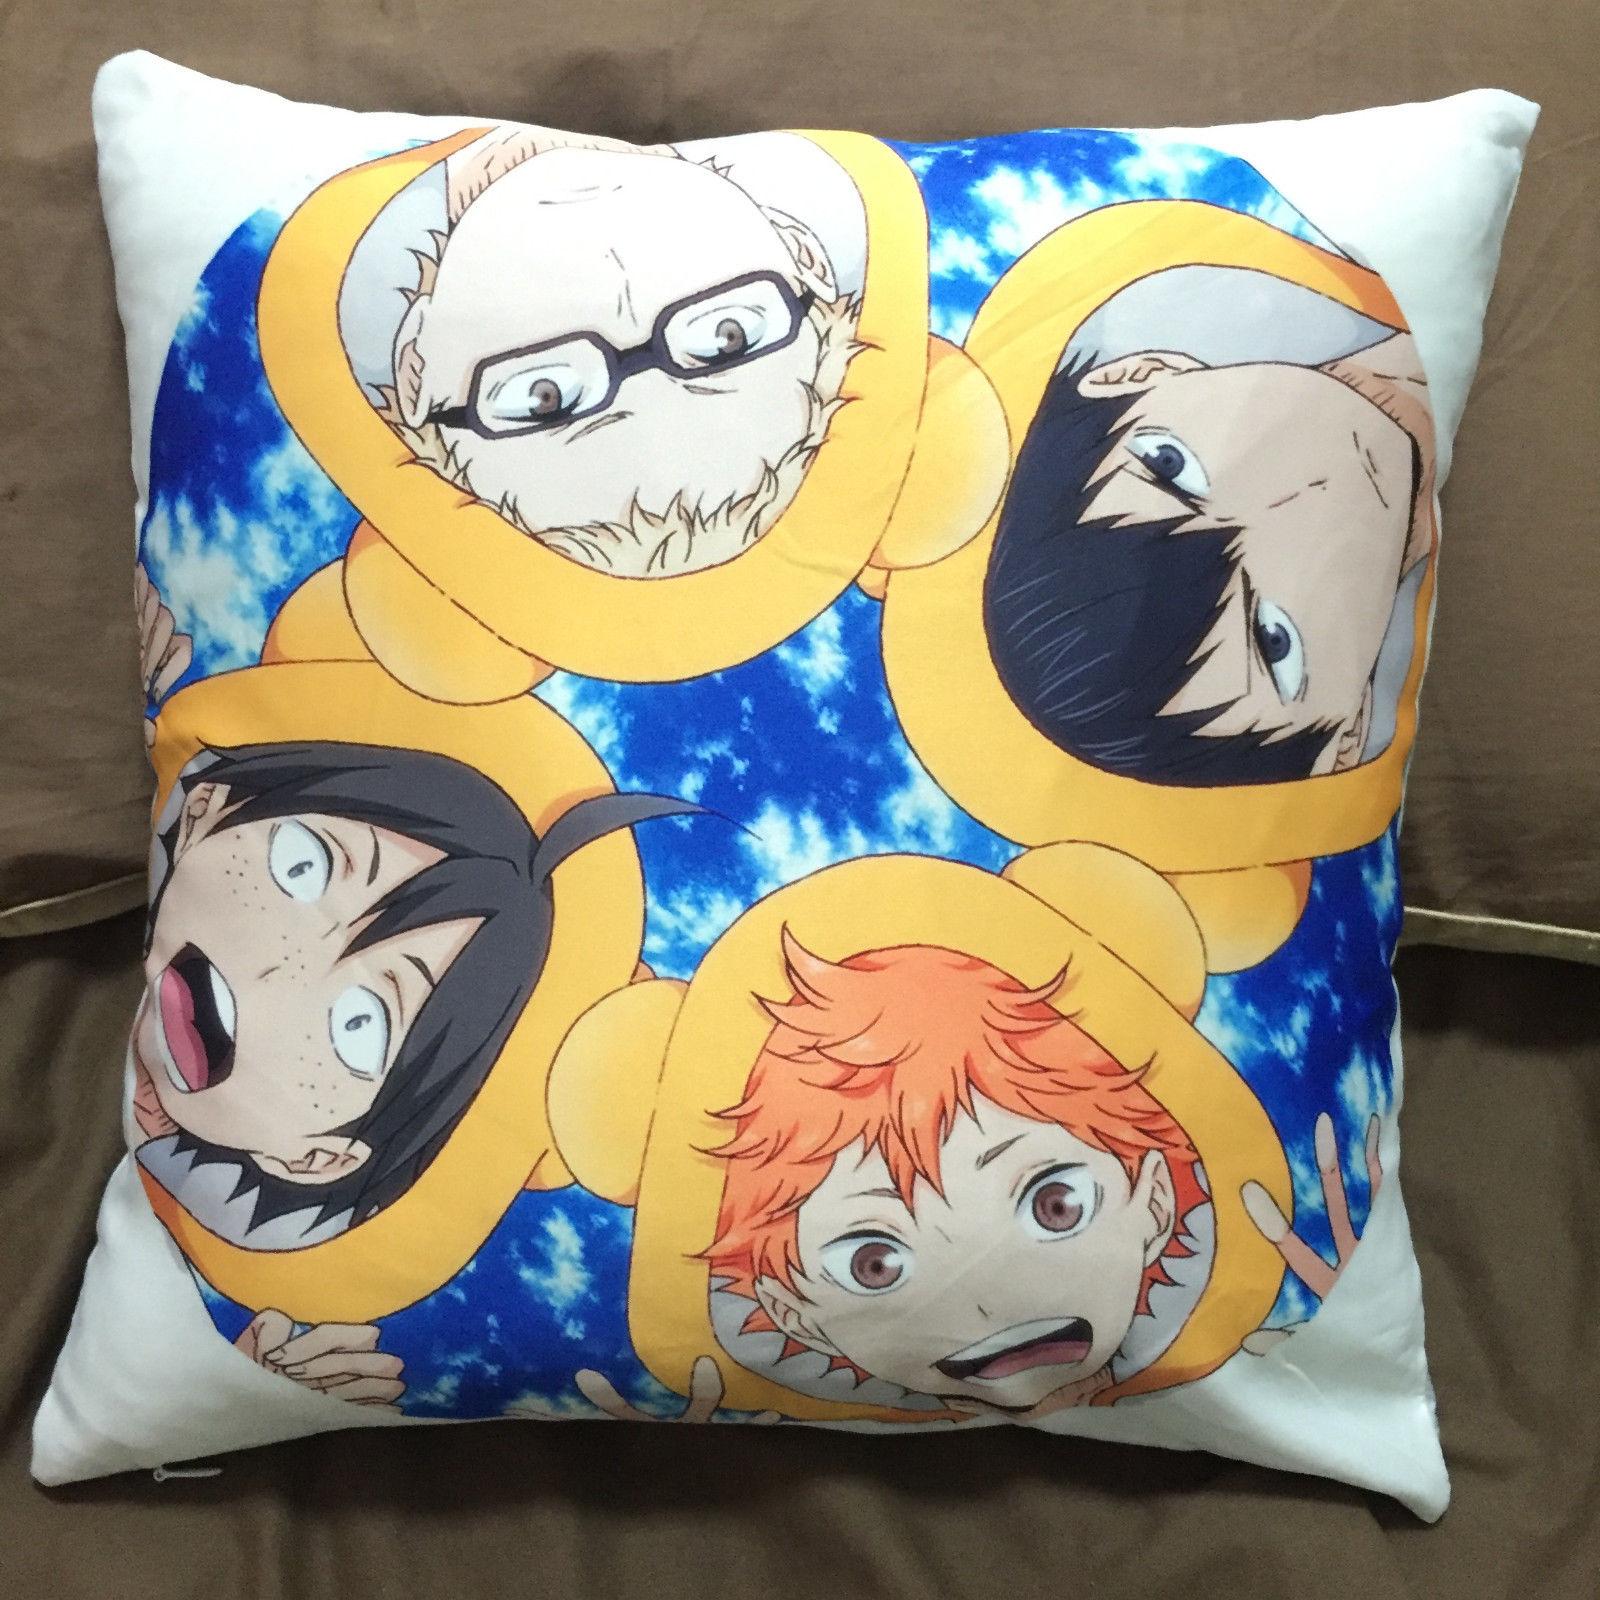 Anime Haikyuu Haikyuu! double sided Pillow cushion Case Cover cosplay 34